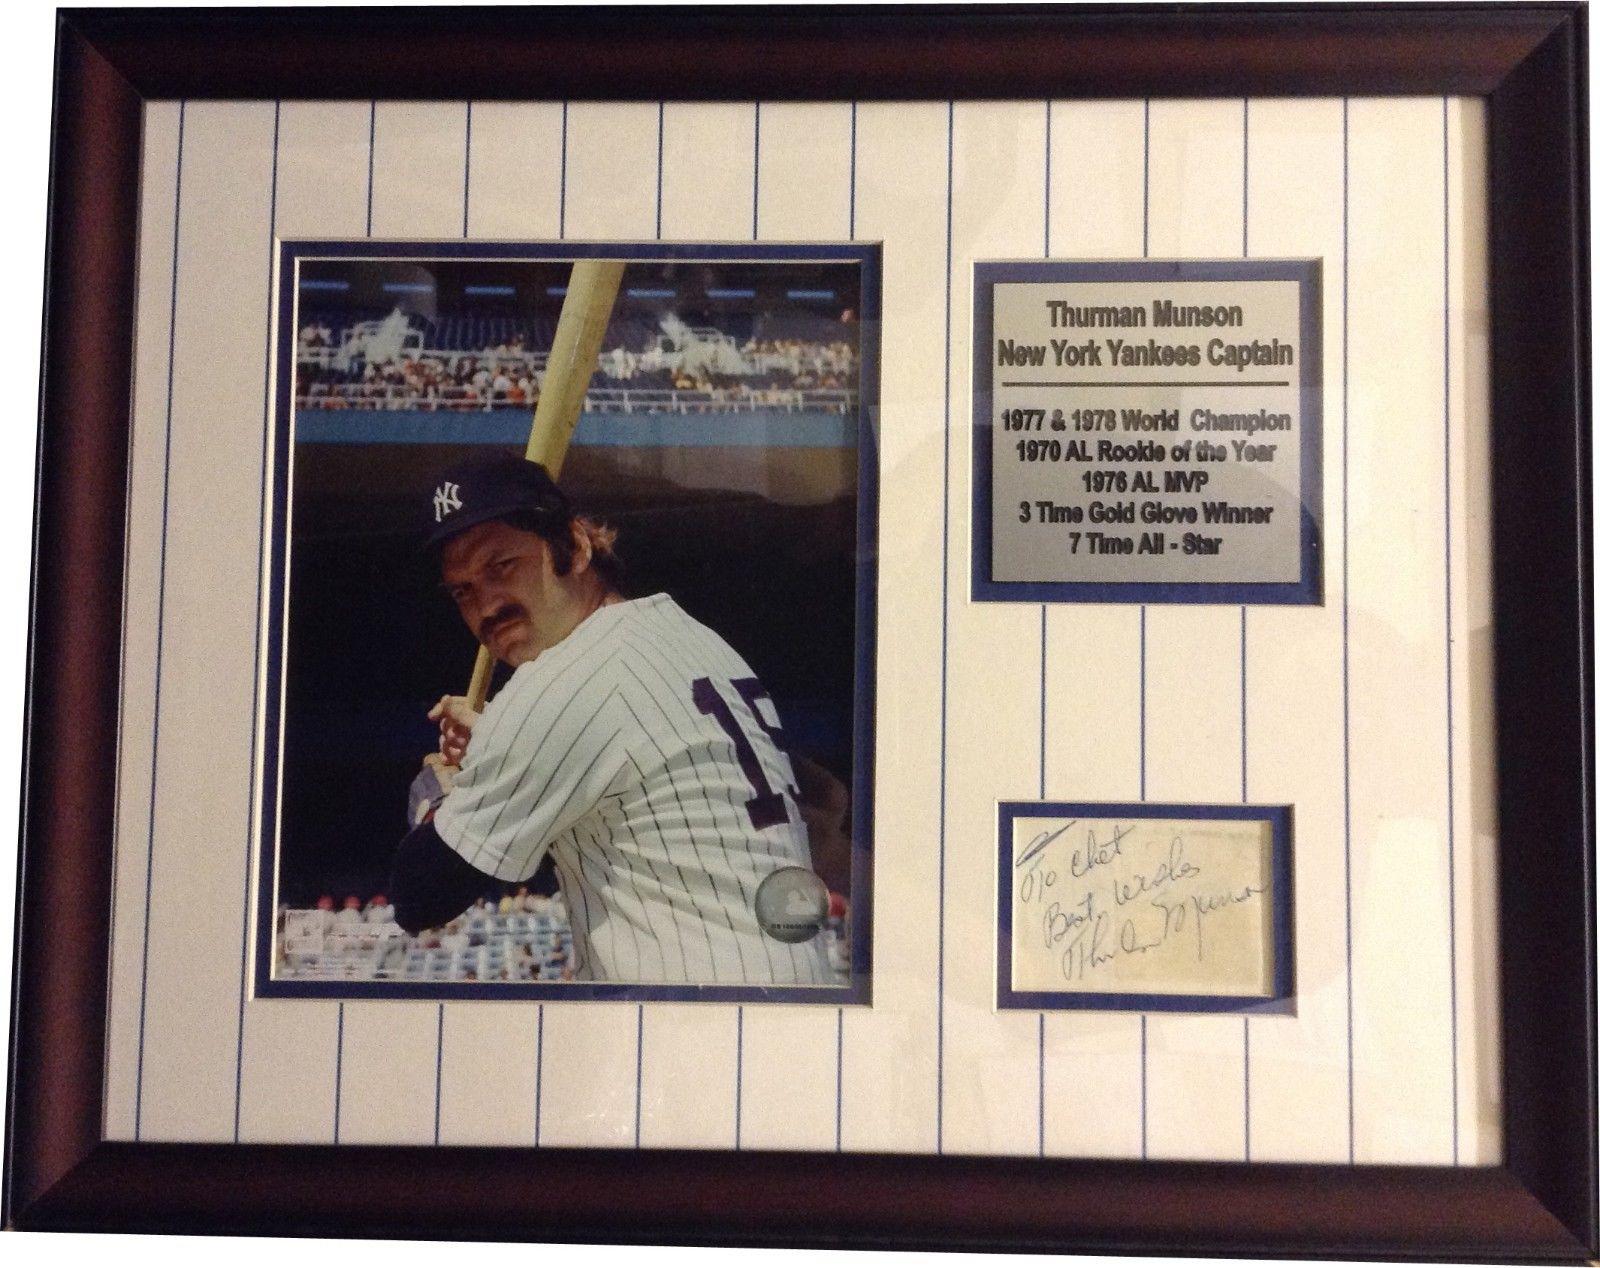 Thurman Munson NY Yankees Captain Cut Signature Framed w/ Photo & Plaque PSA DNA